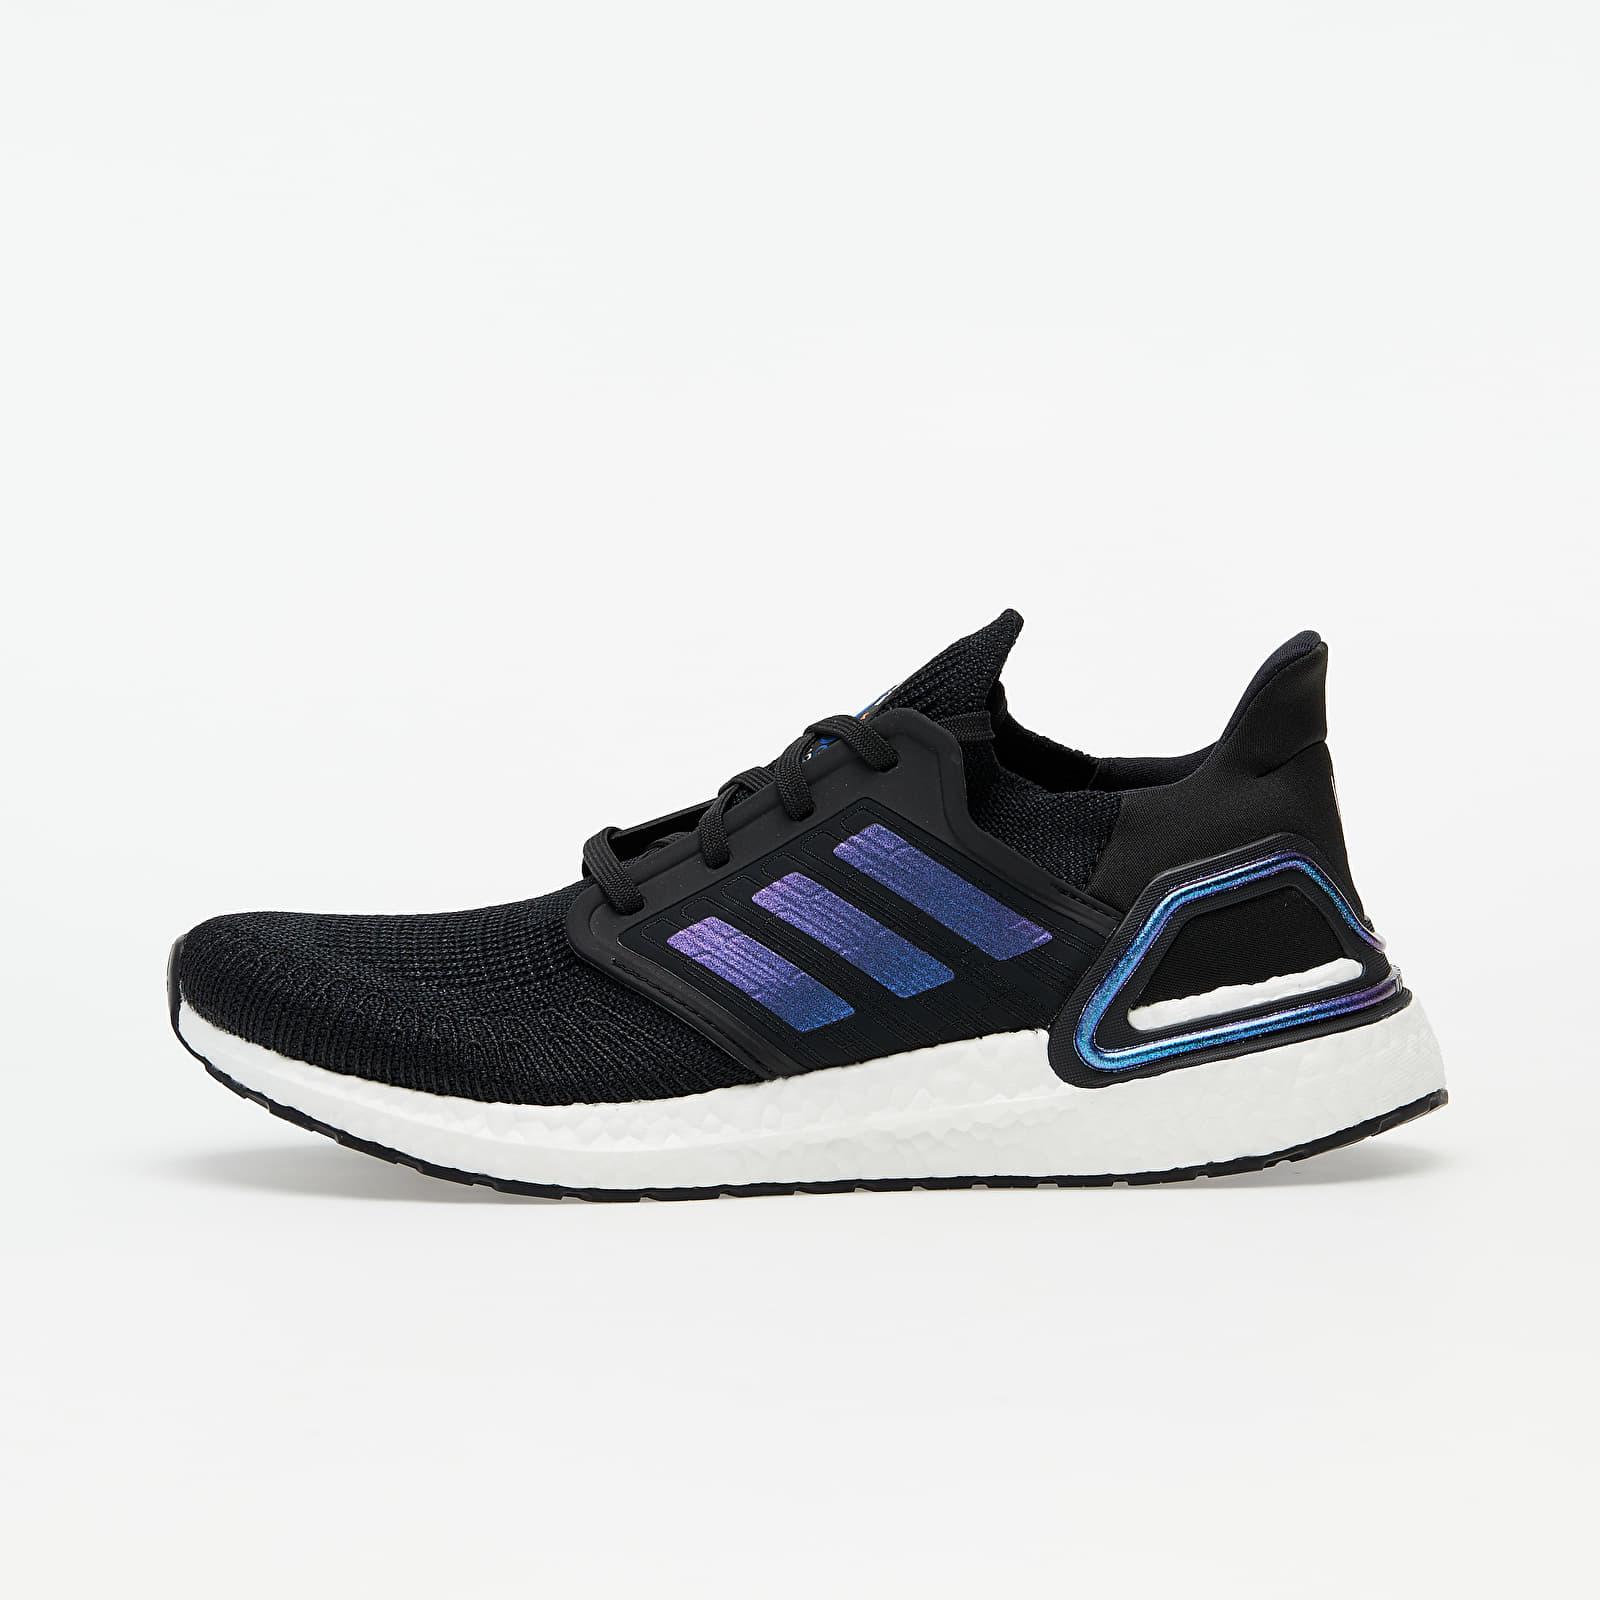 adidas UltraBOOST 20 Core Black/ Blue Vime/ Ftw White EUR 43 1/3